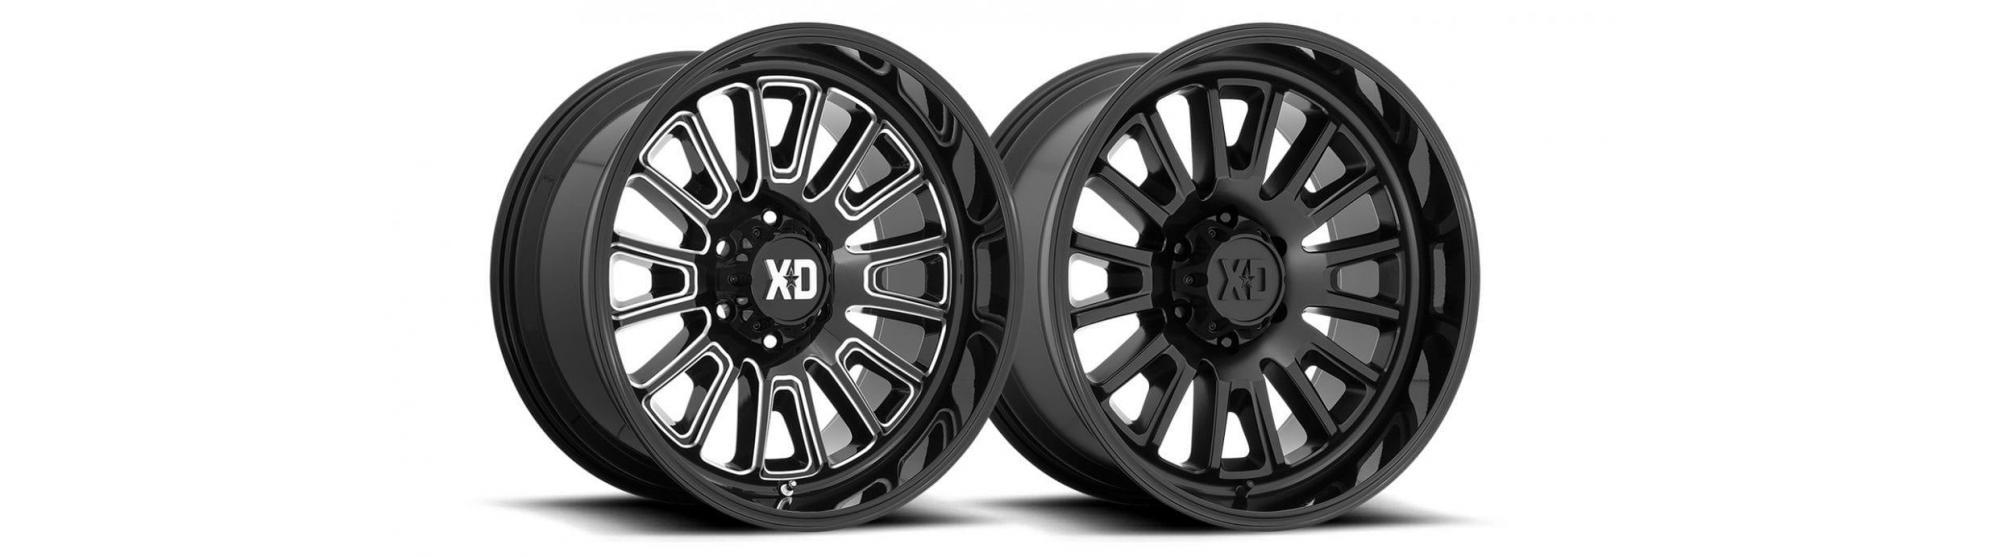 XD XD864 ROVER